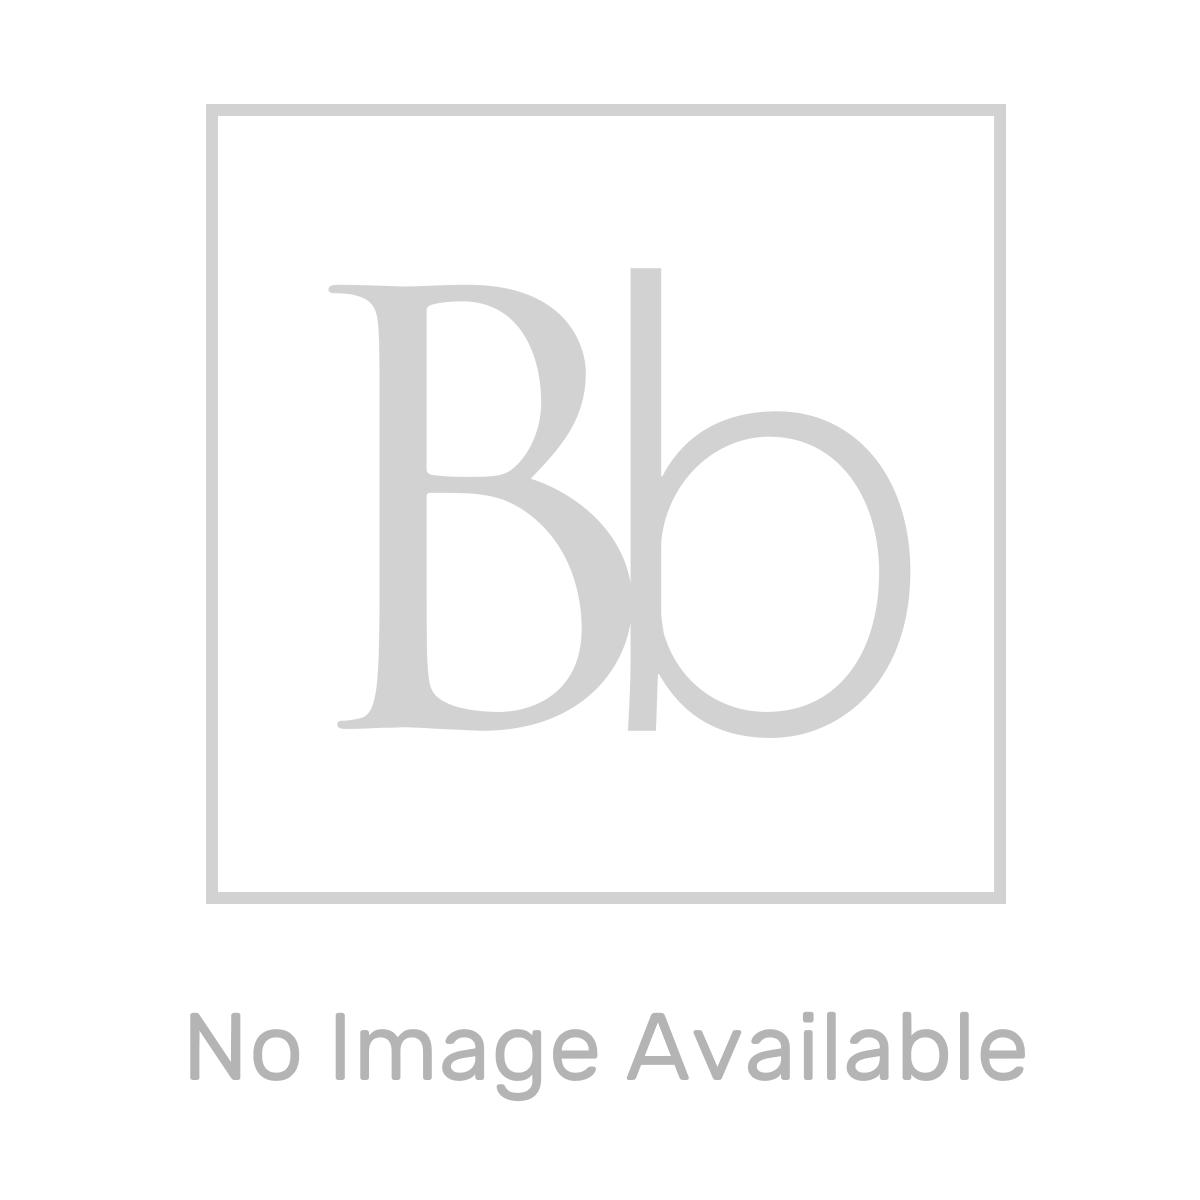 Premier High Gloss White Bathroom Mirror and Light 450mm